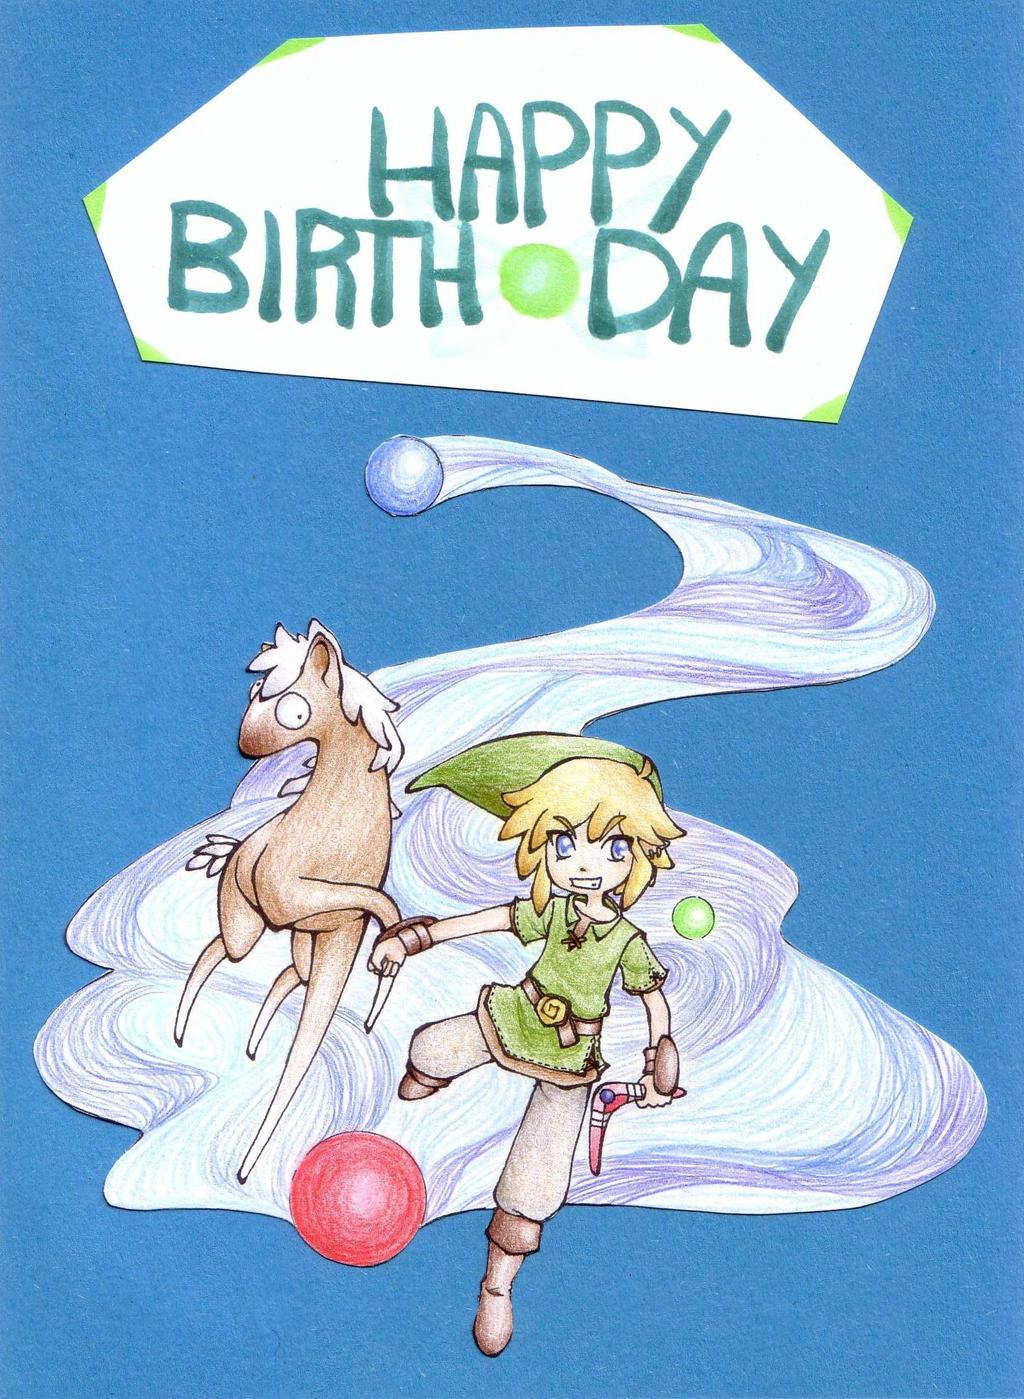 The Legend of Zelda - Birthday Card by Leoloum on DeviantArt